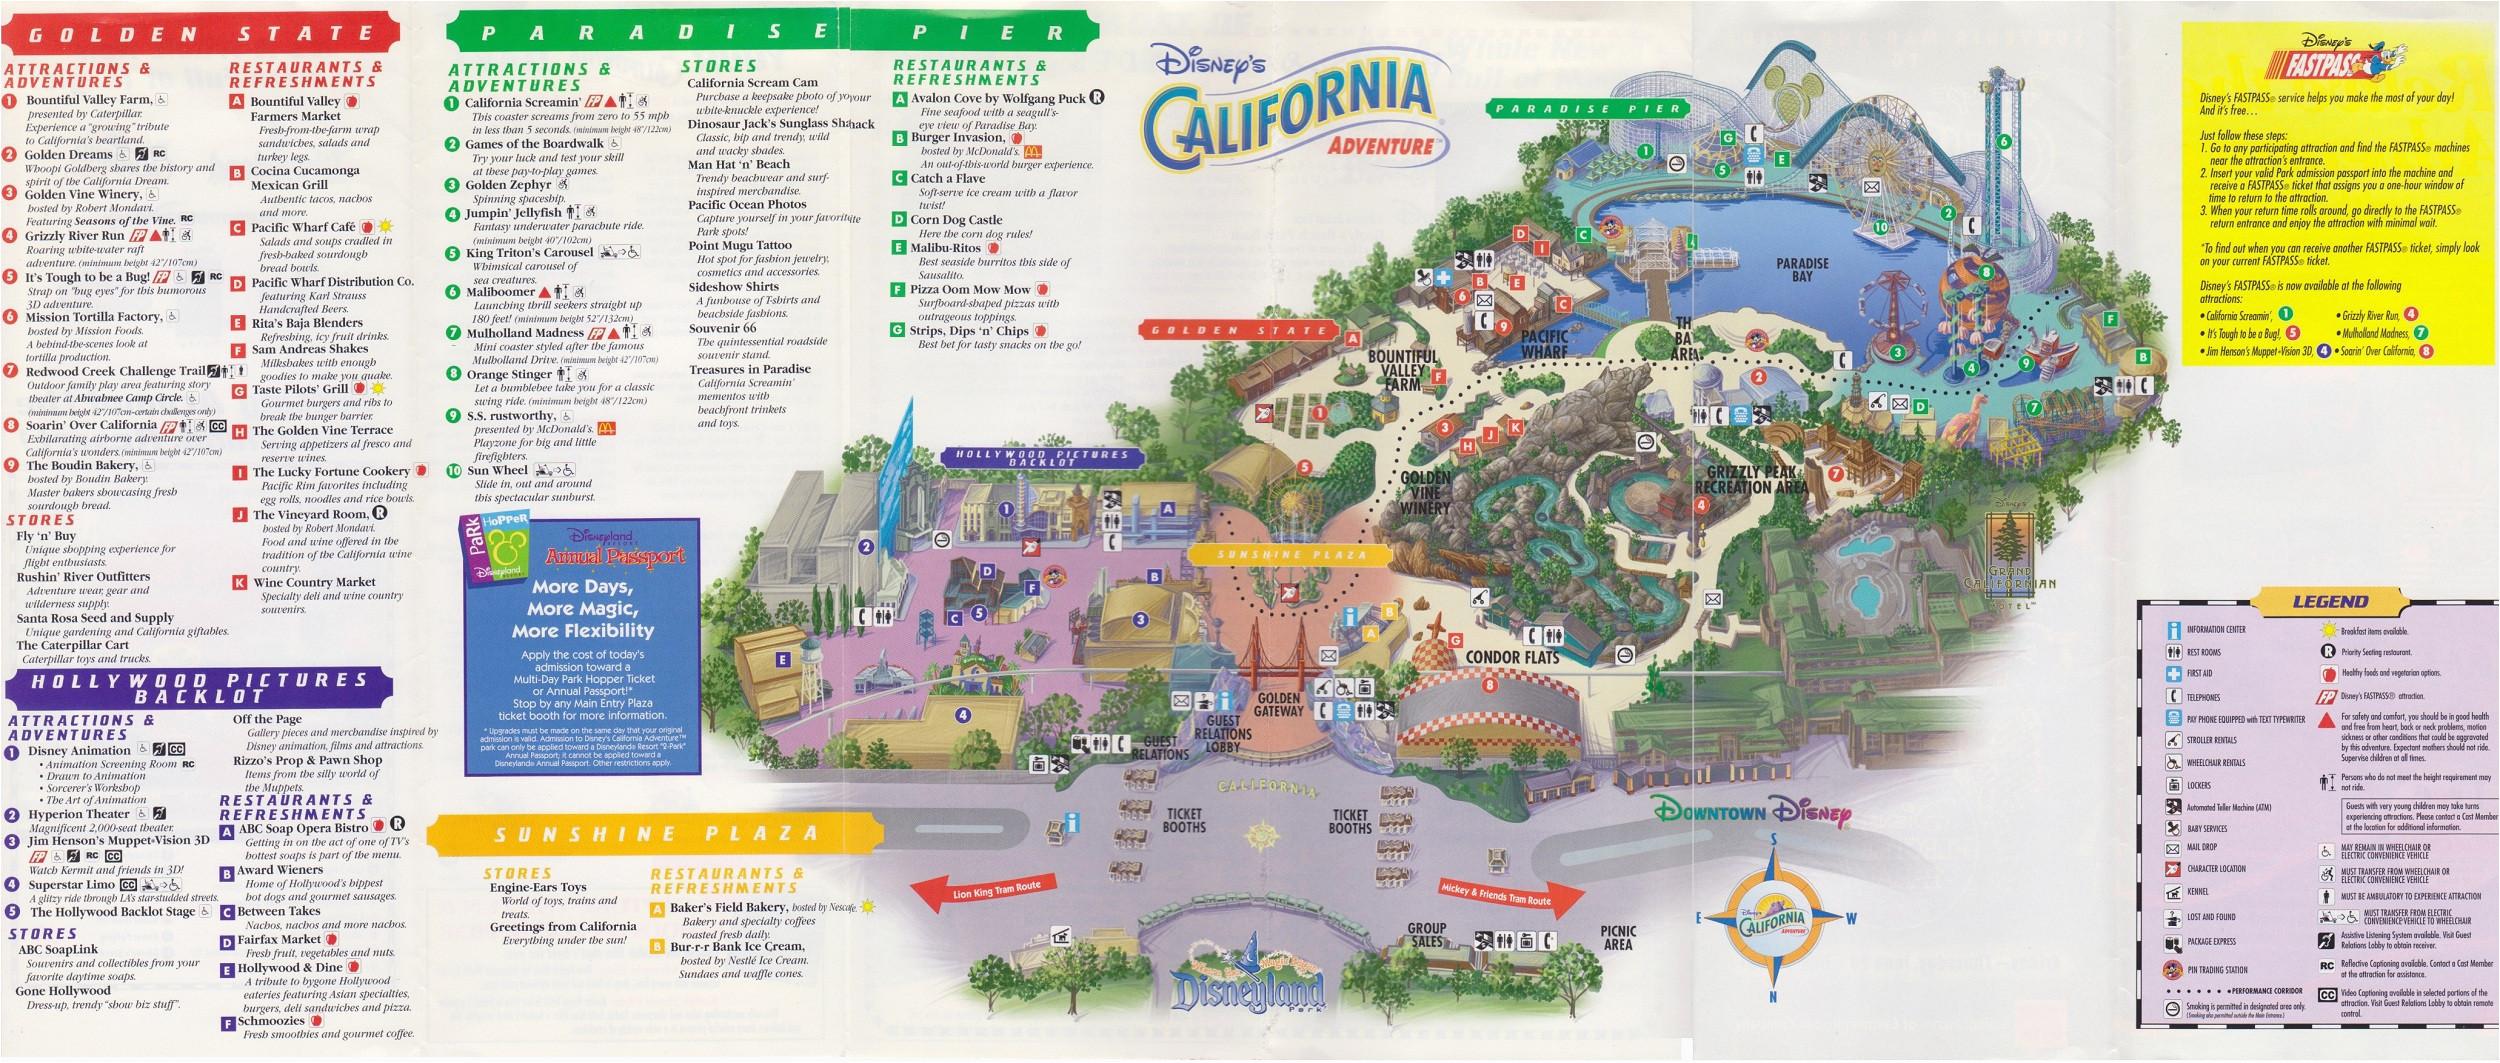 map of disney california adventure california adventure land map